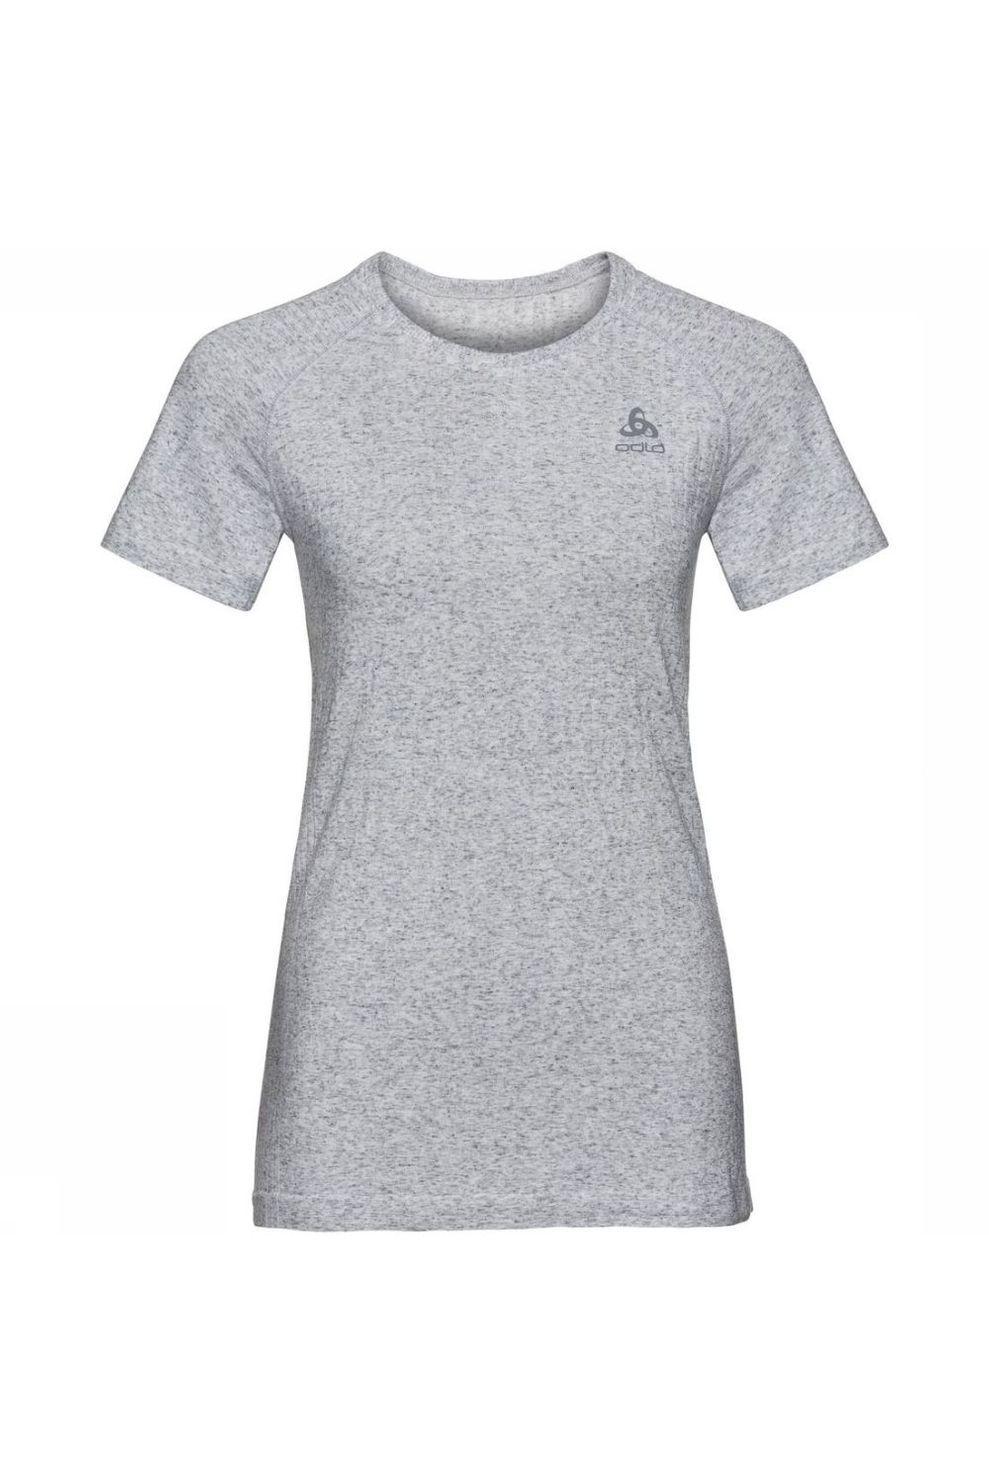 Odlo T-Shirt Millennium Linencool voor dames - Grijs/ Gemengd - Maten: S, M